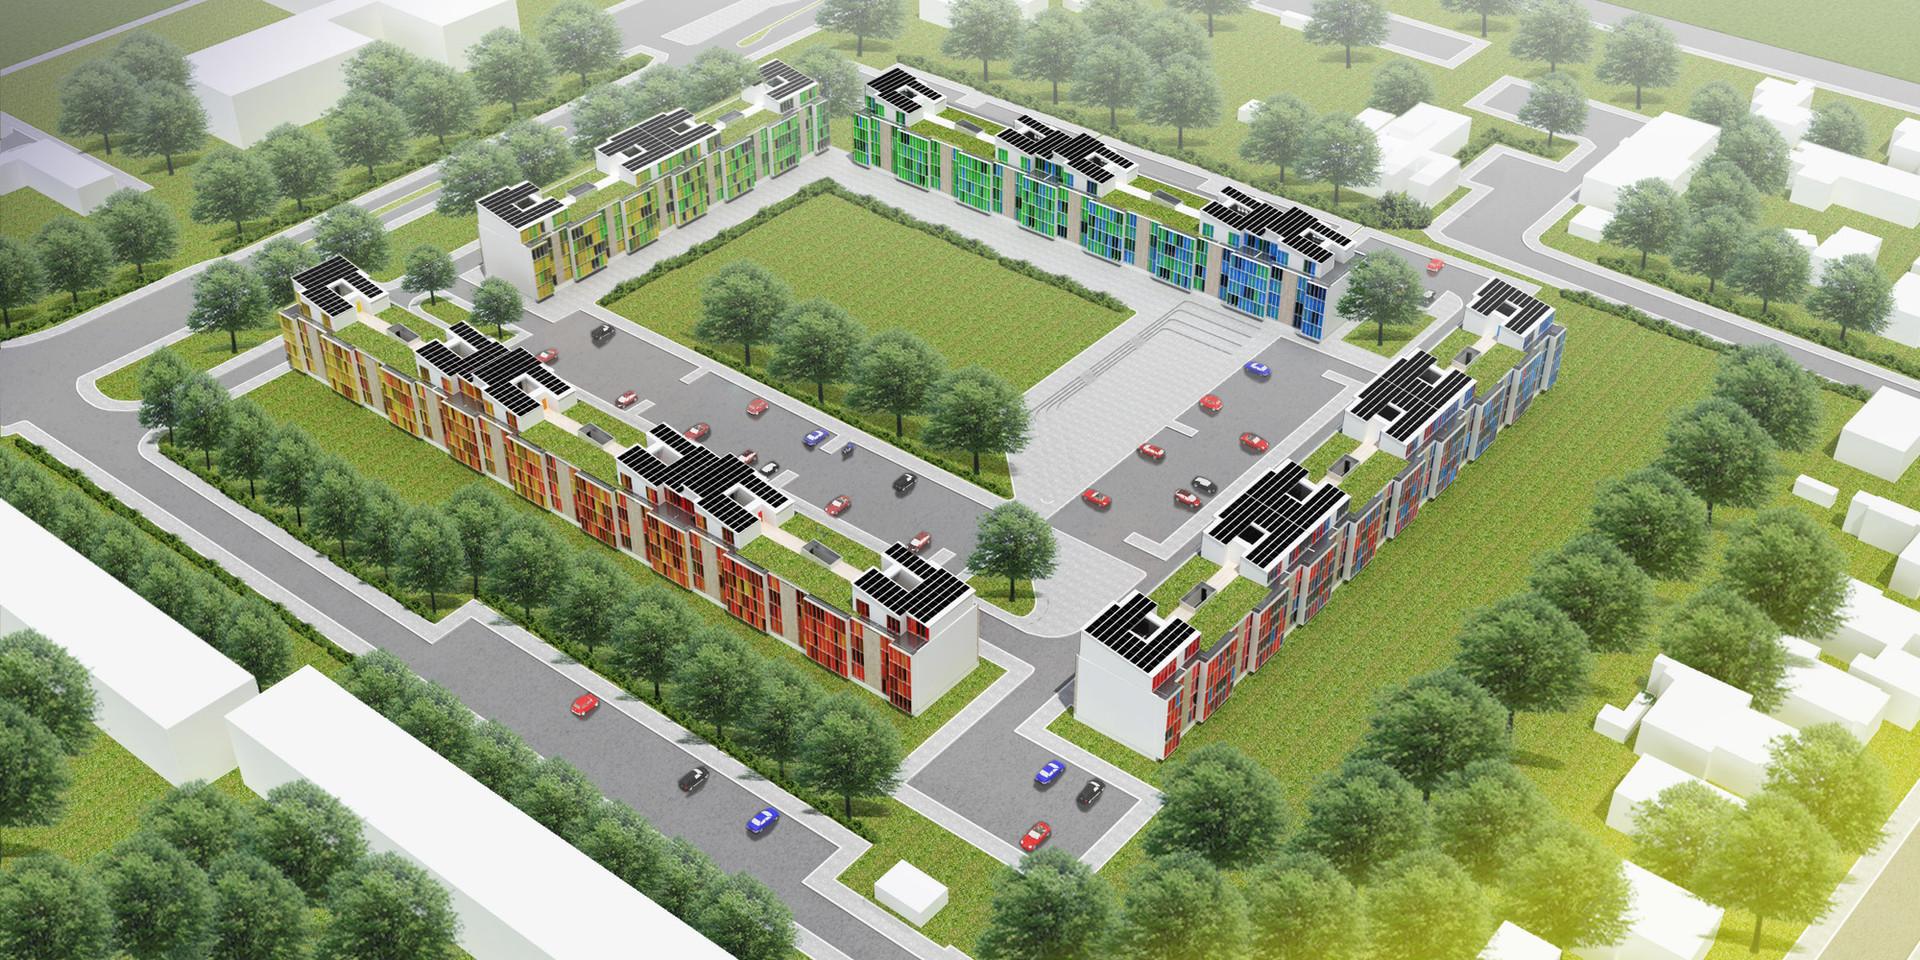 Ellebo Housing Renovation Aerial View